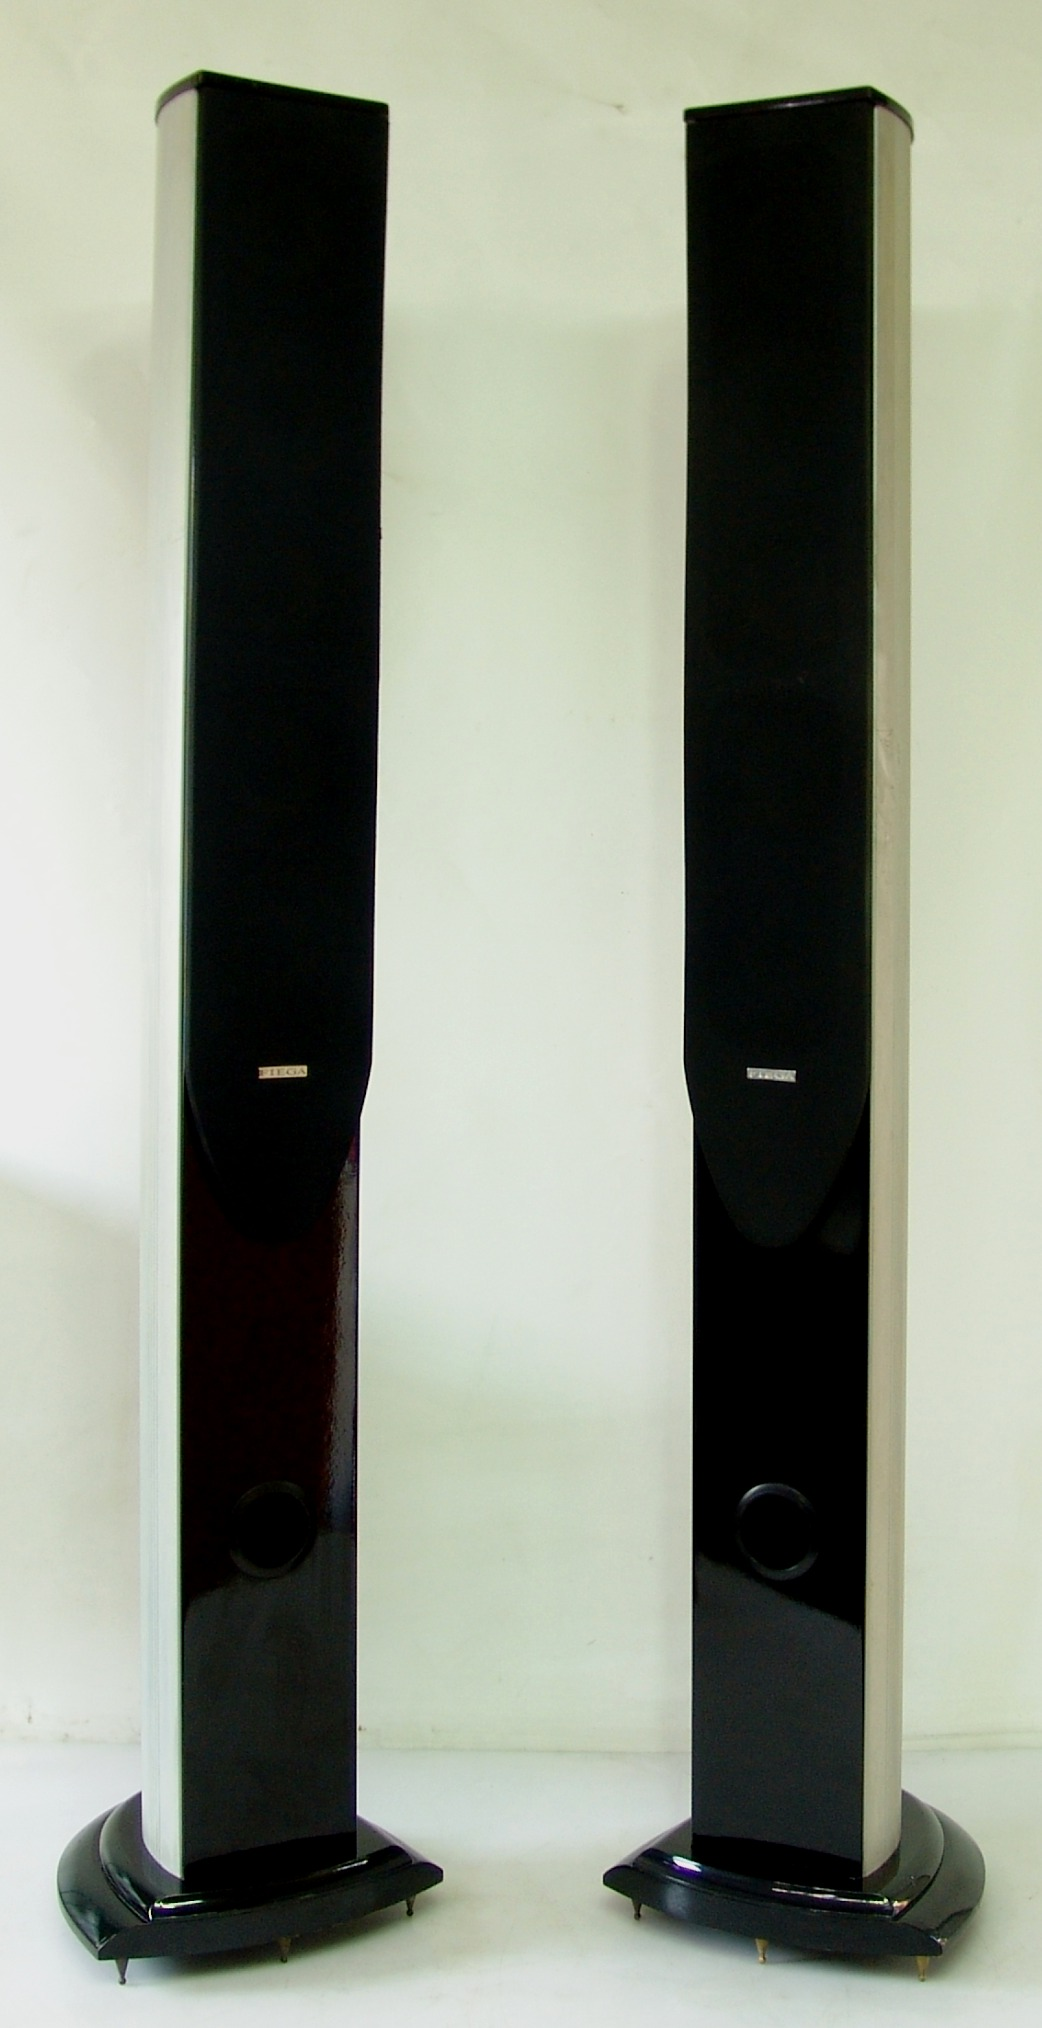 ps-4401bb (1).JPG